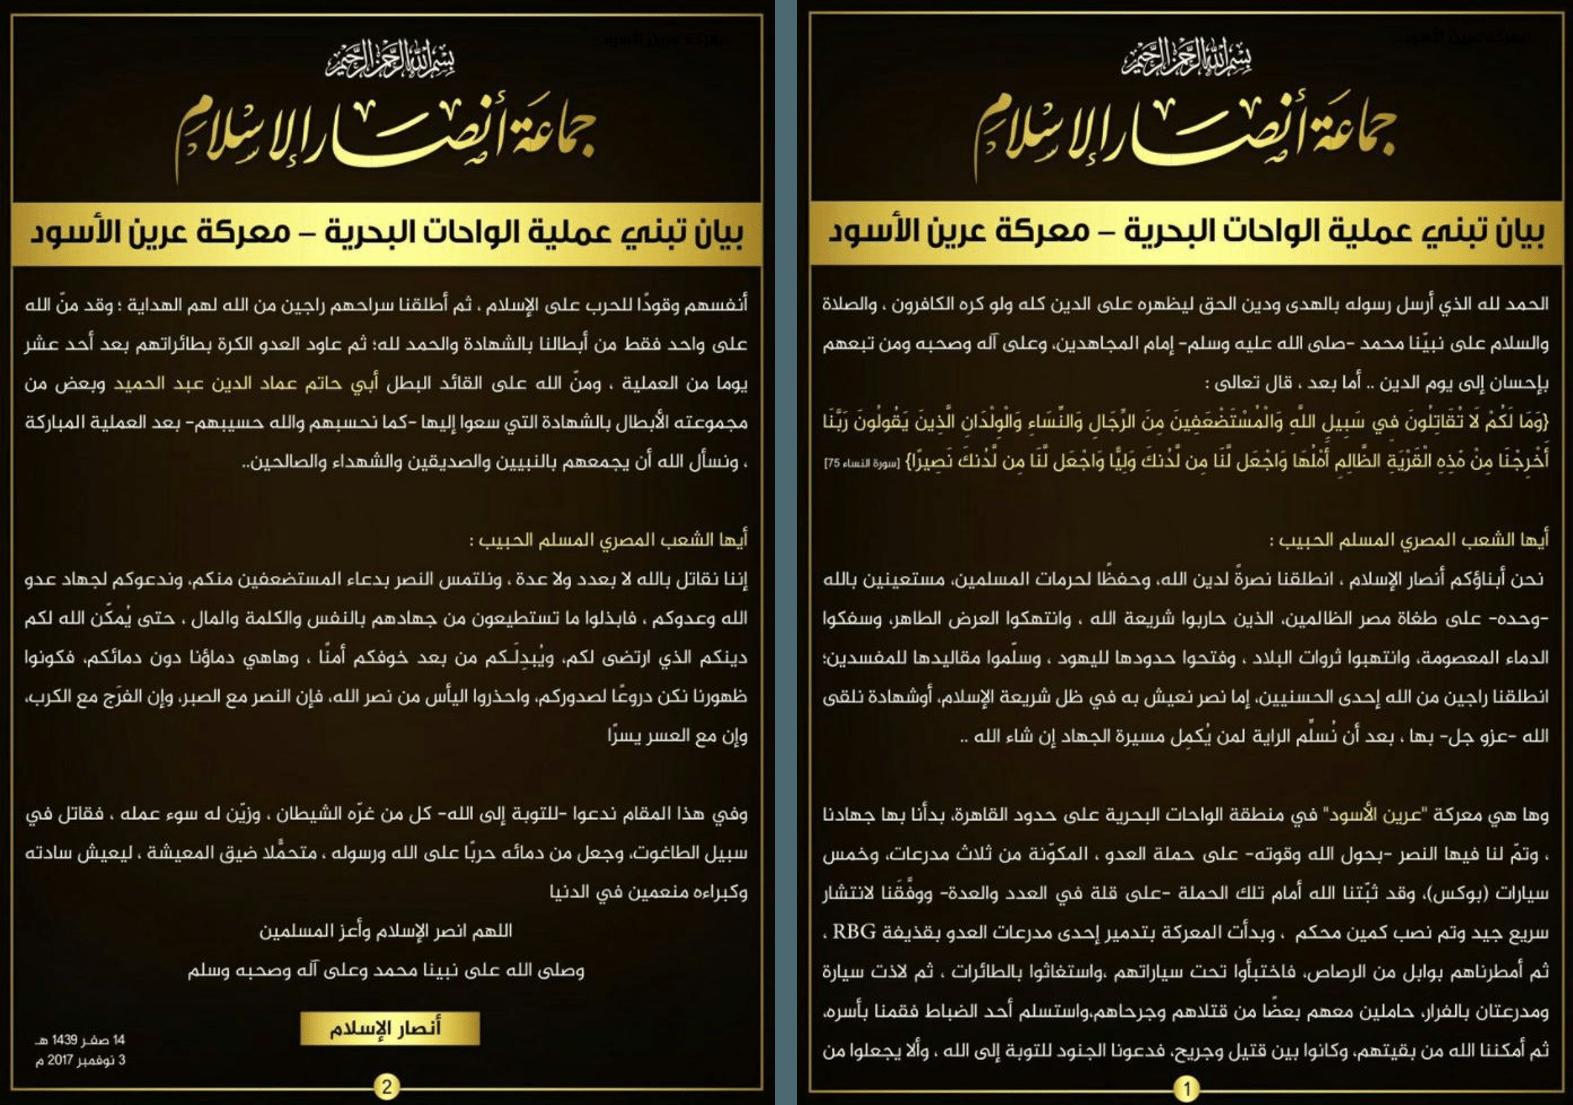 Jamaat Ansar al-Islam's claim of responsibilityJamaat Ansar al-Islam's claim of responsibility